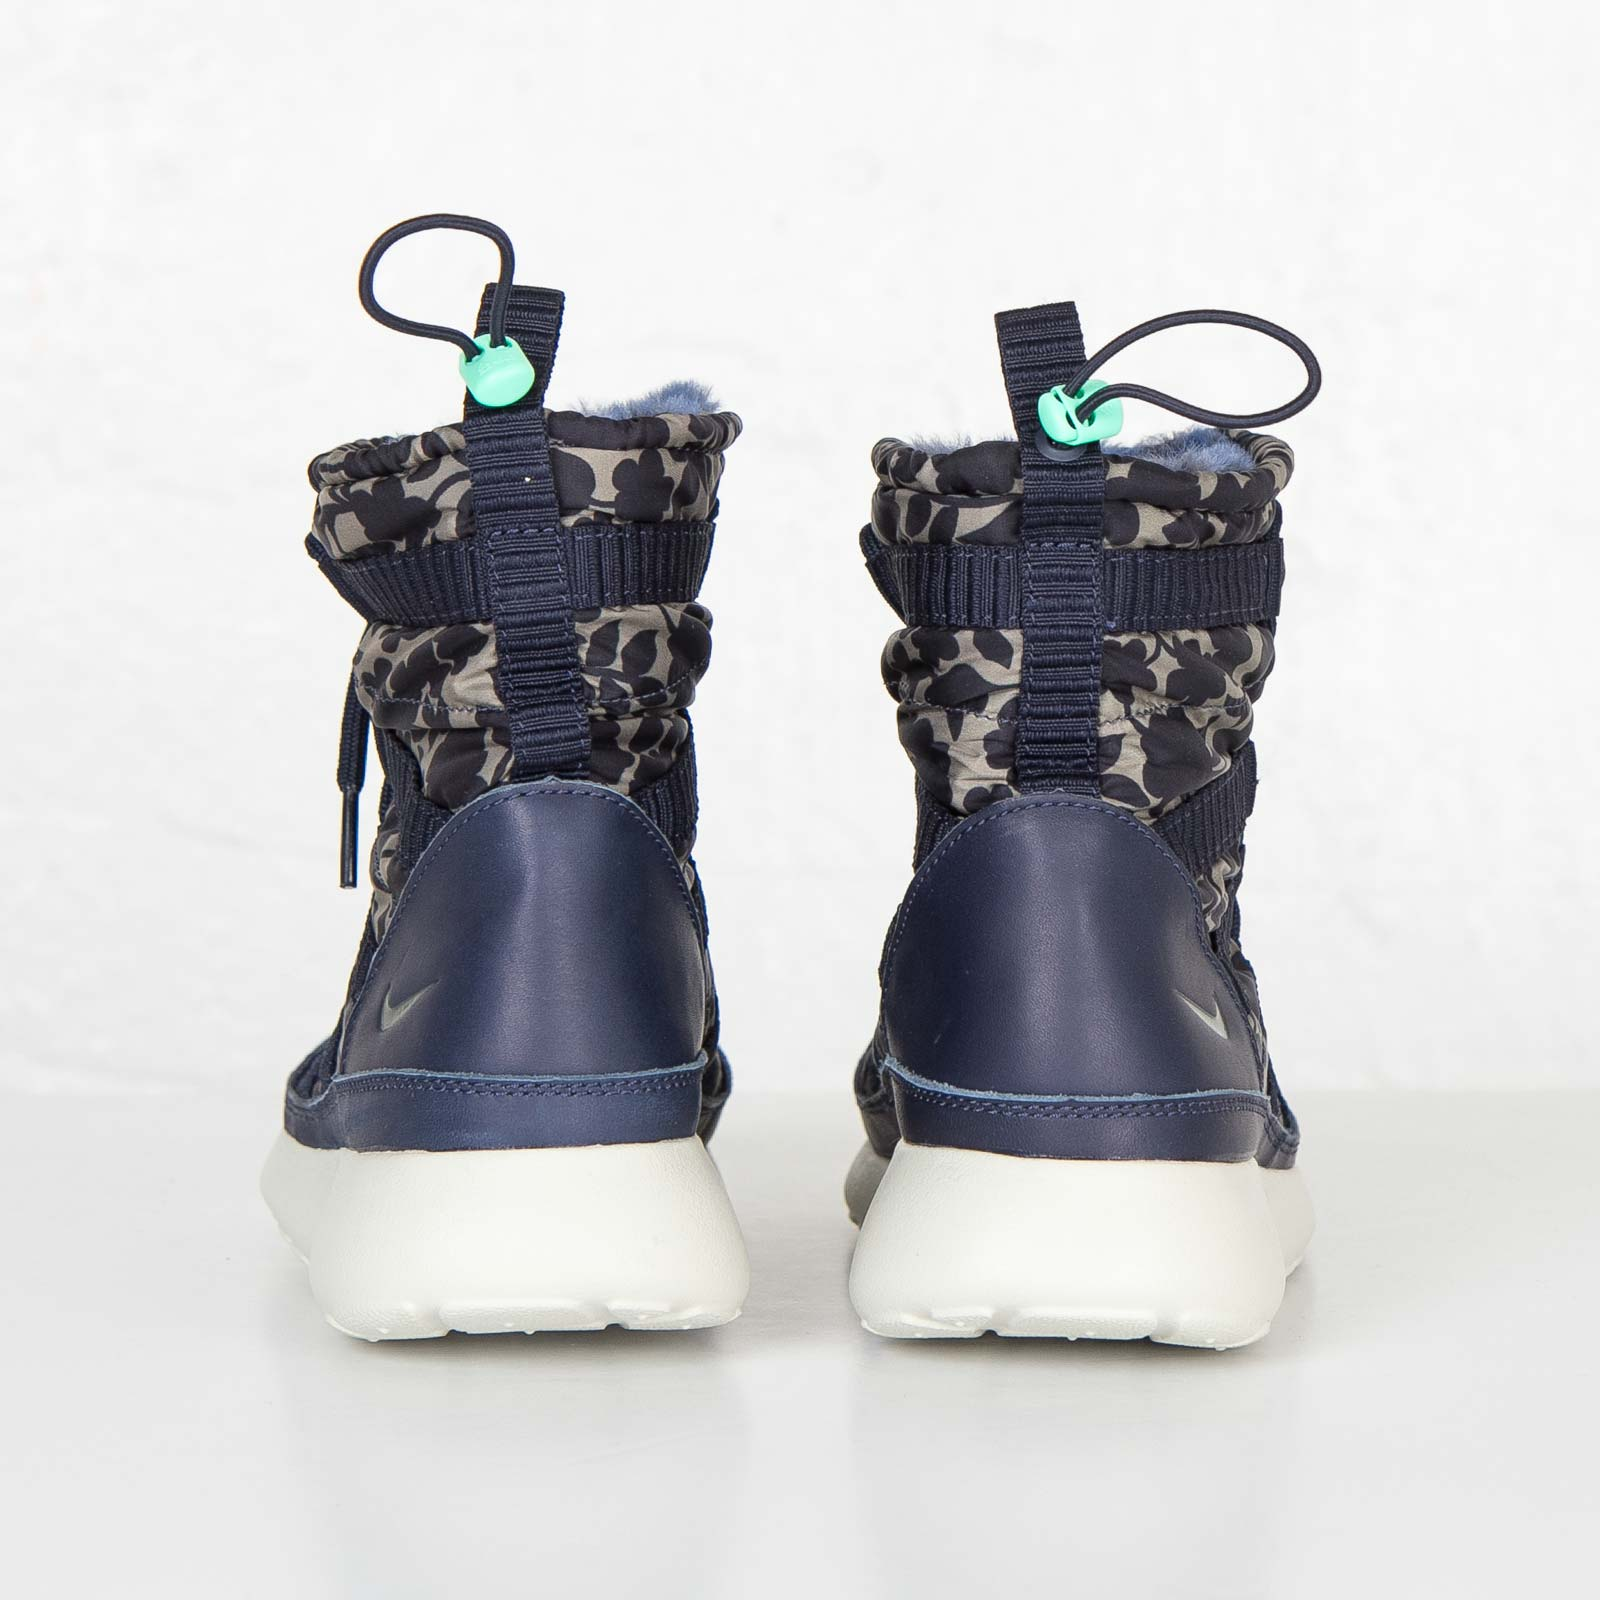 Céntrico Turismo Gasto  Nike W Roshe One Hi Lib QS - 821776-400 - Sneakersnstuff | sneakers &  streetwear online since 1999